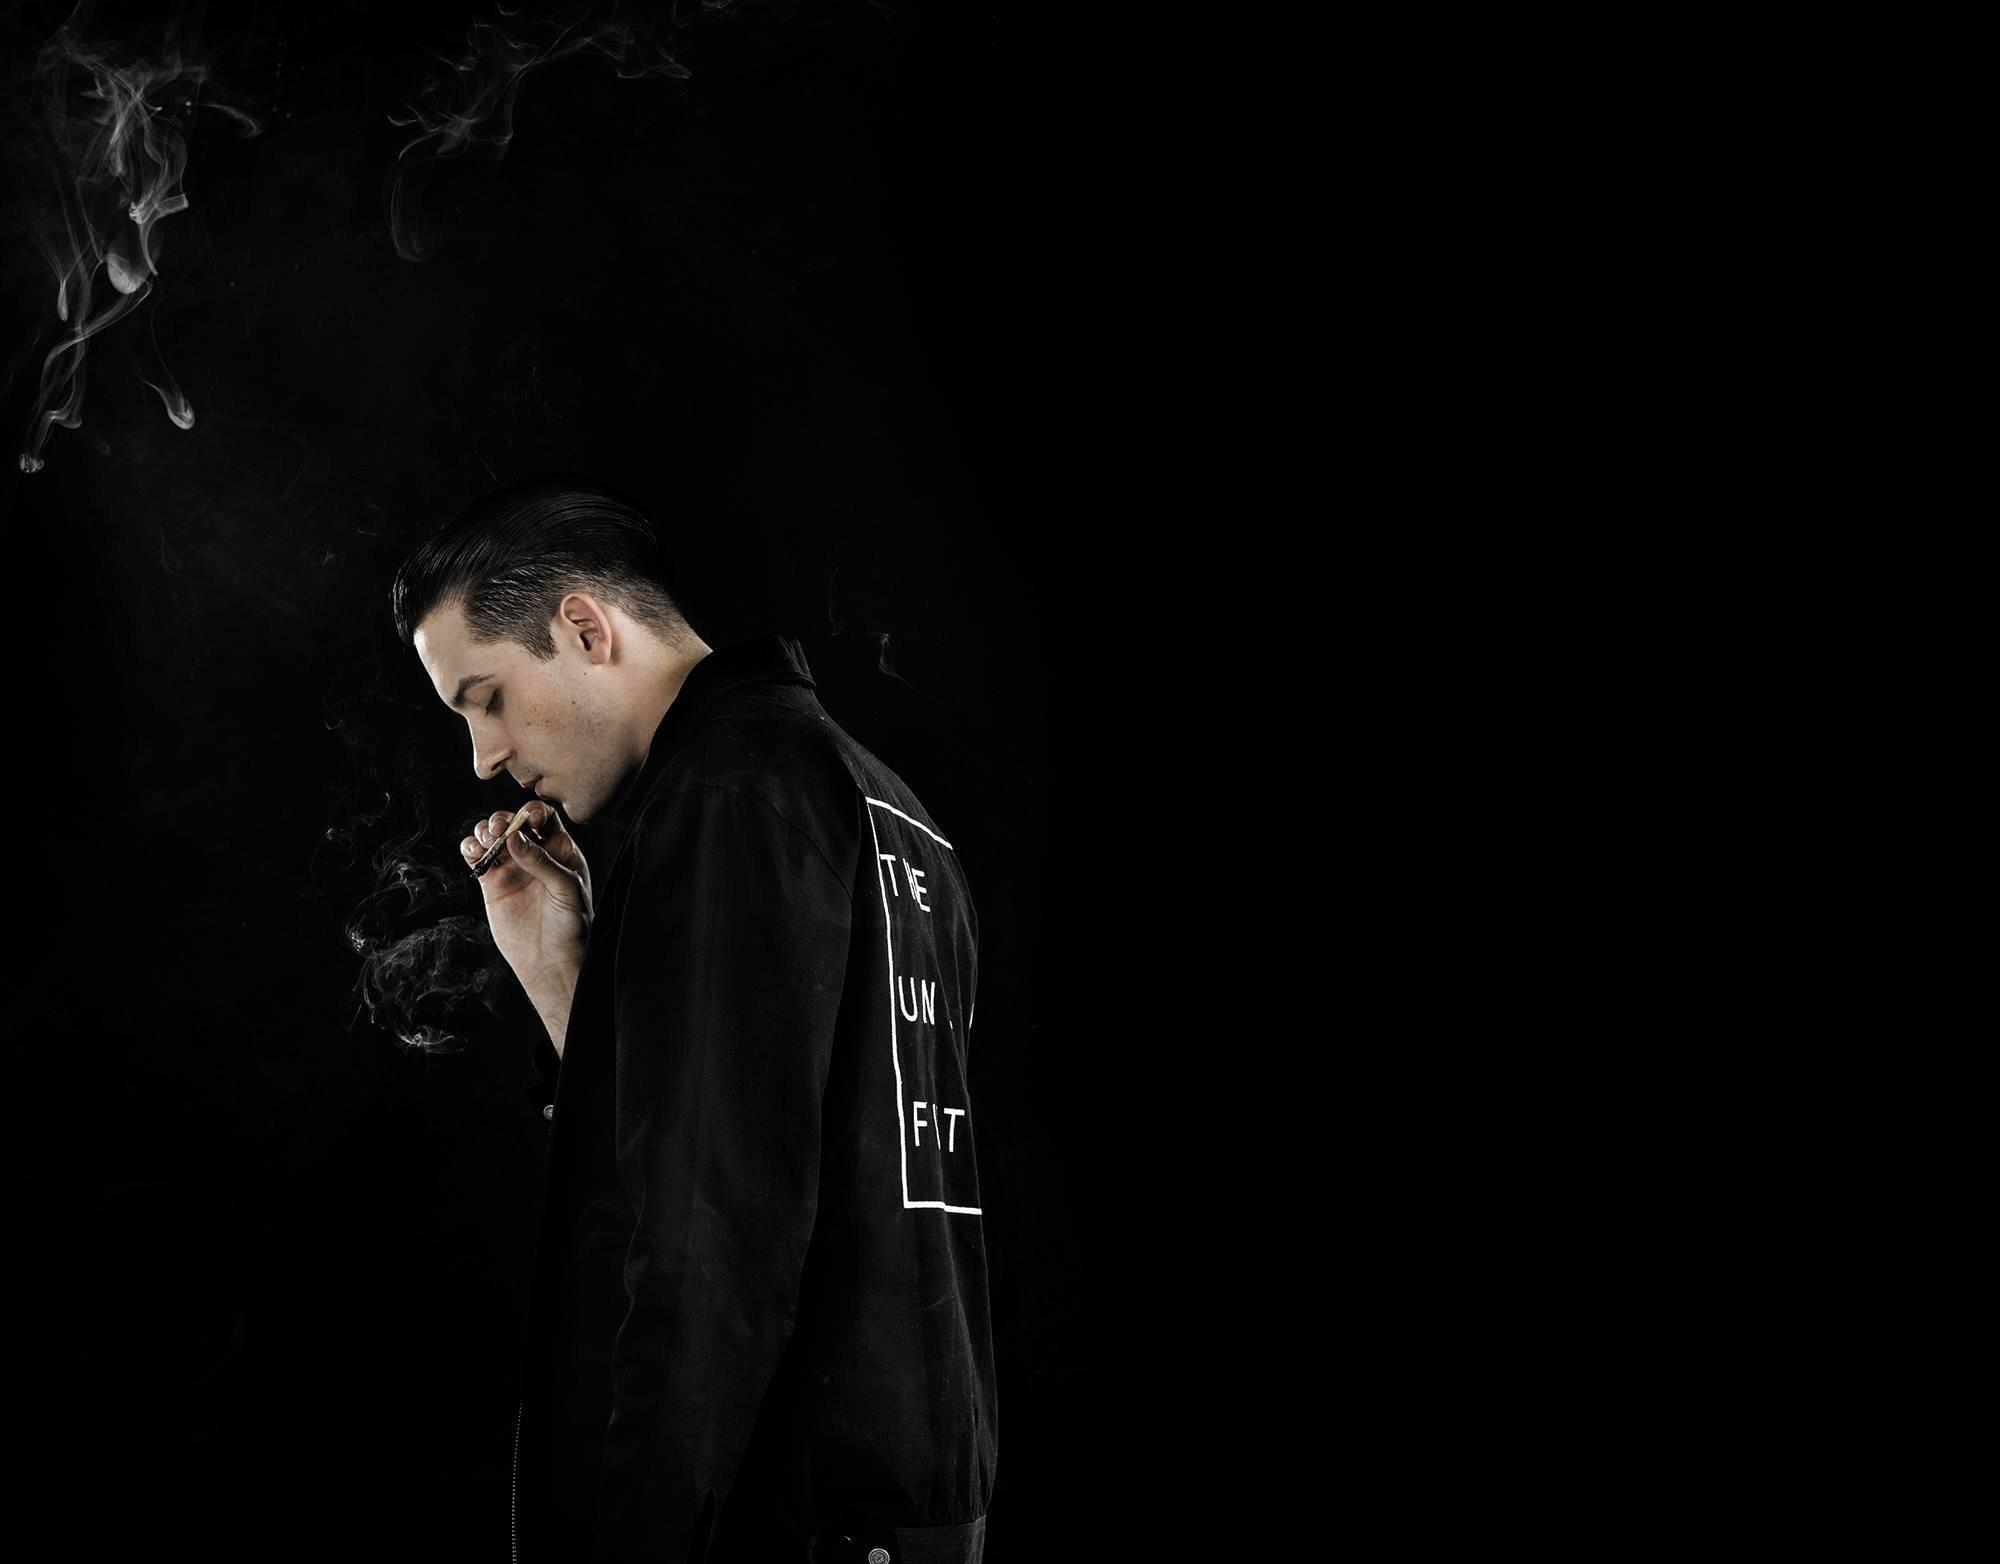 hhG-Eazy – artist photos